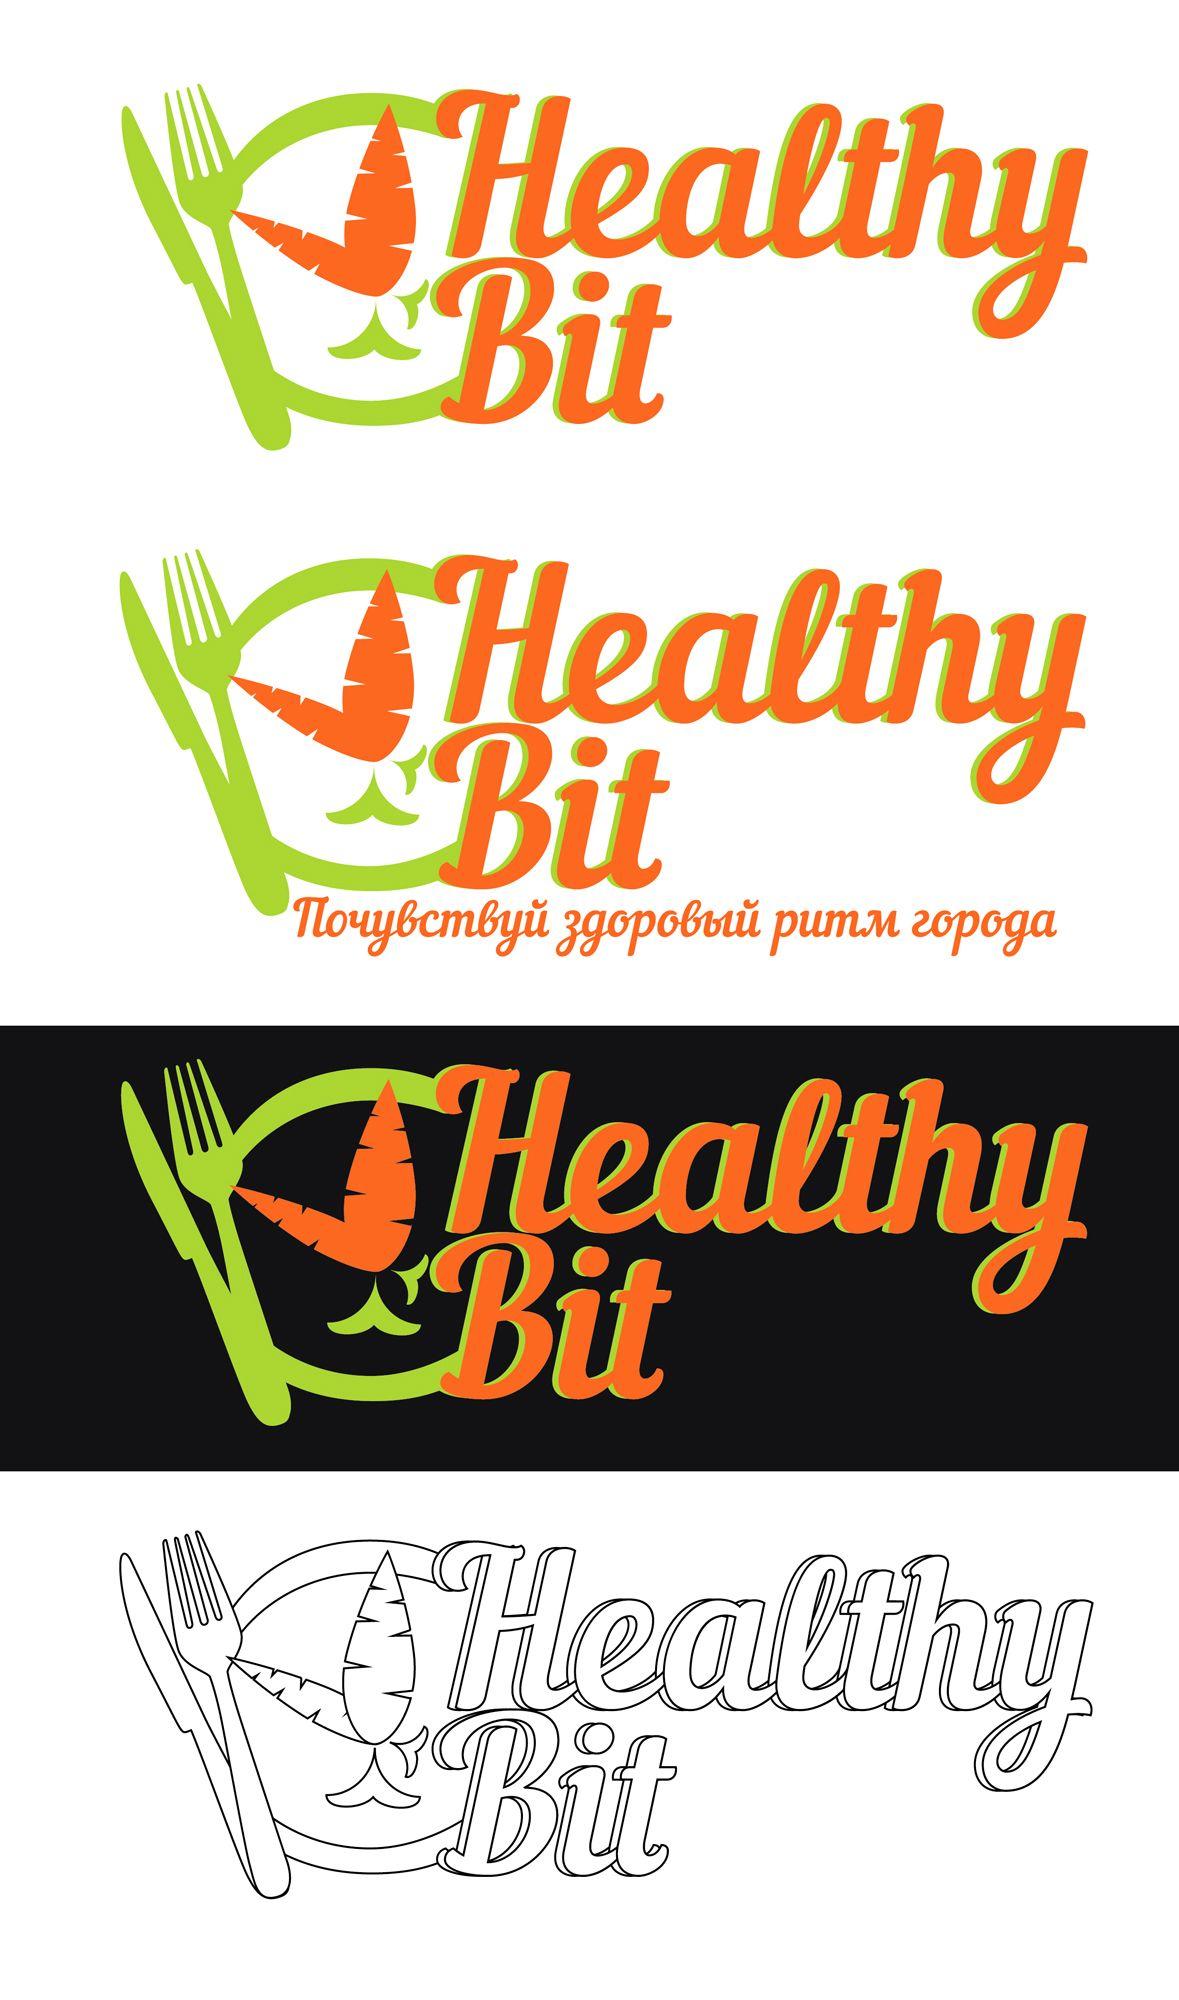 Healthy Bit или Healthy Beet - дизайнер Belofchik